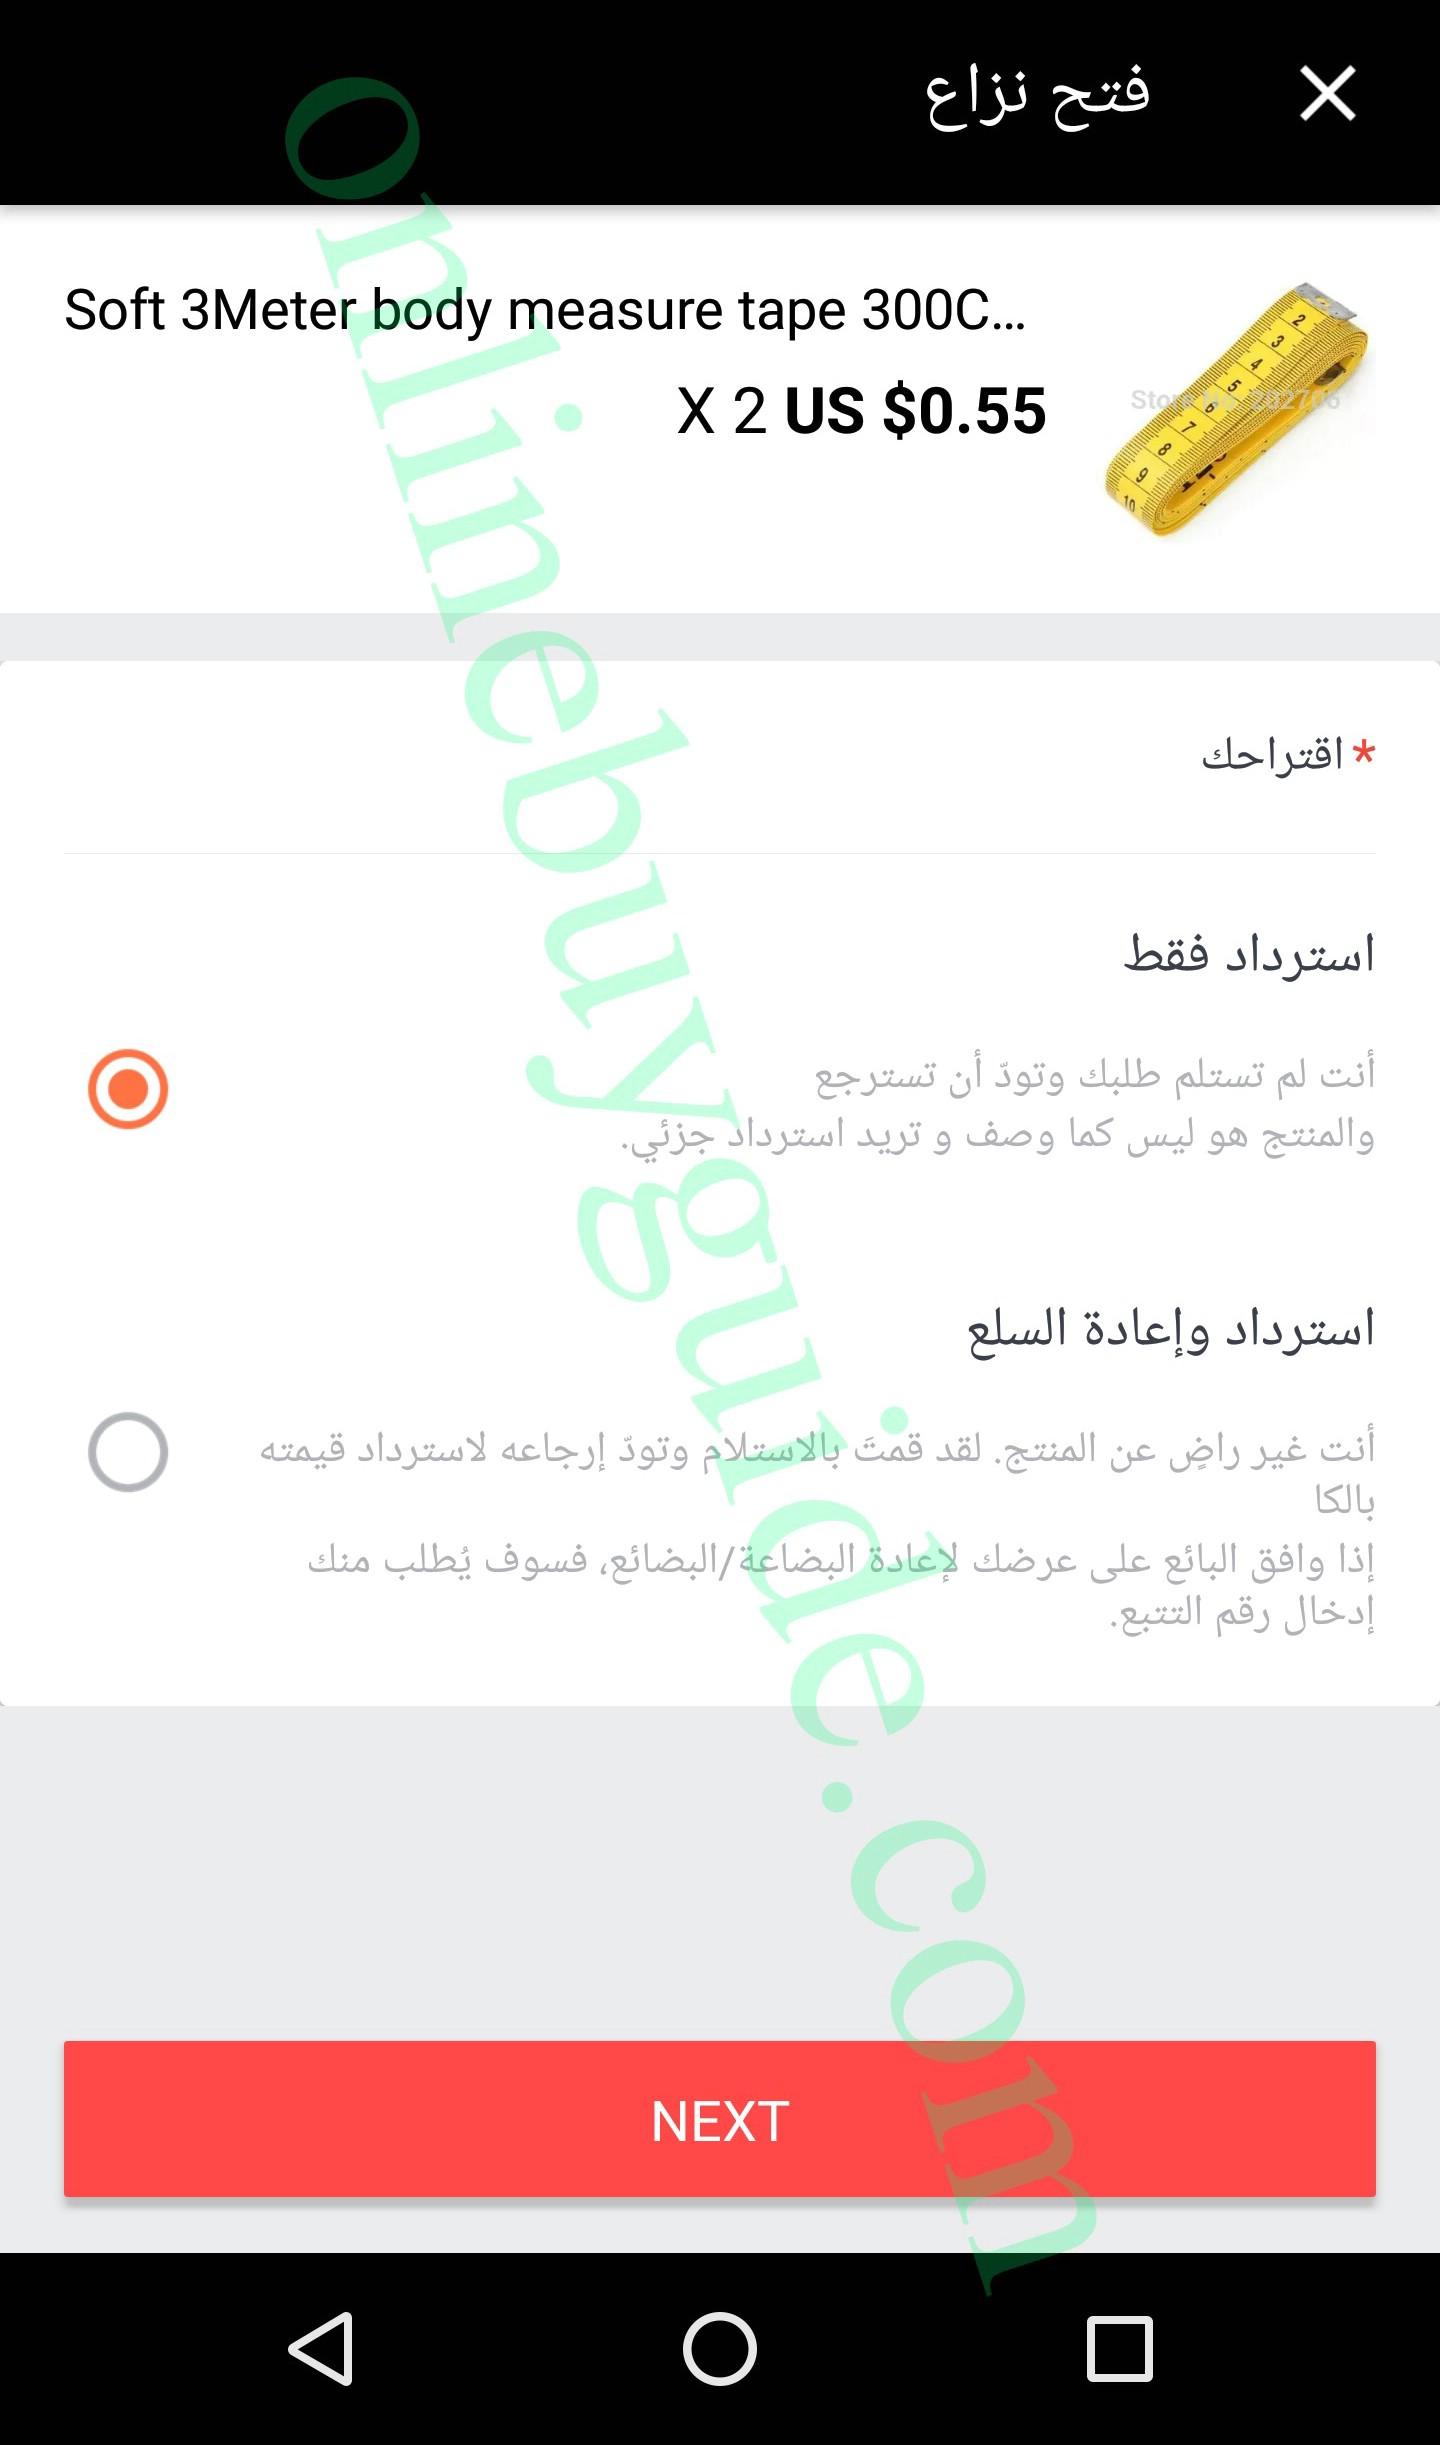 aliexpress direct saudi arabia